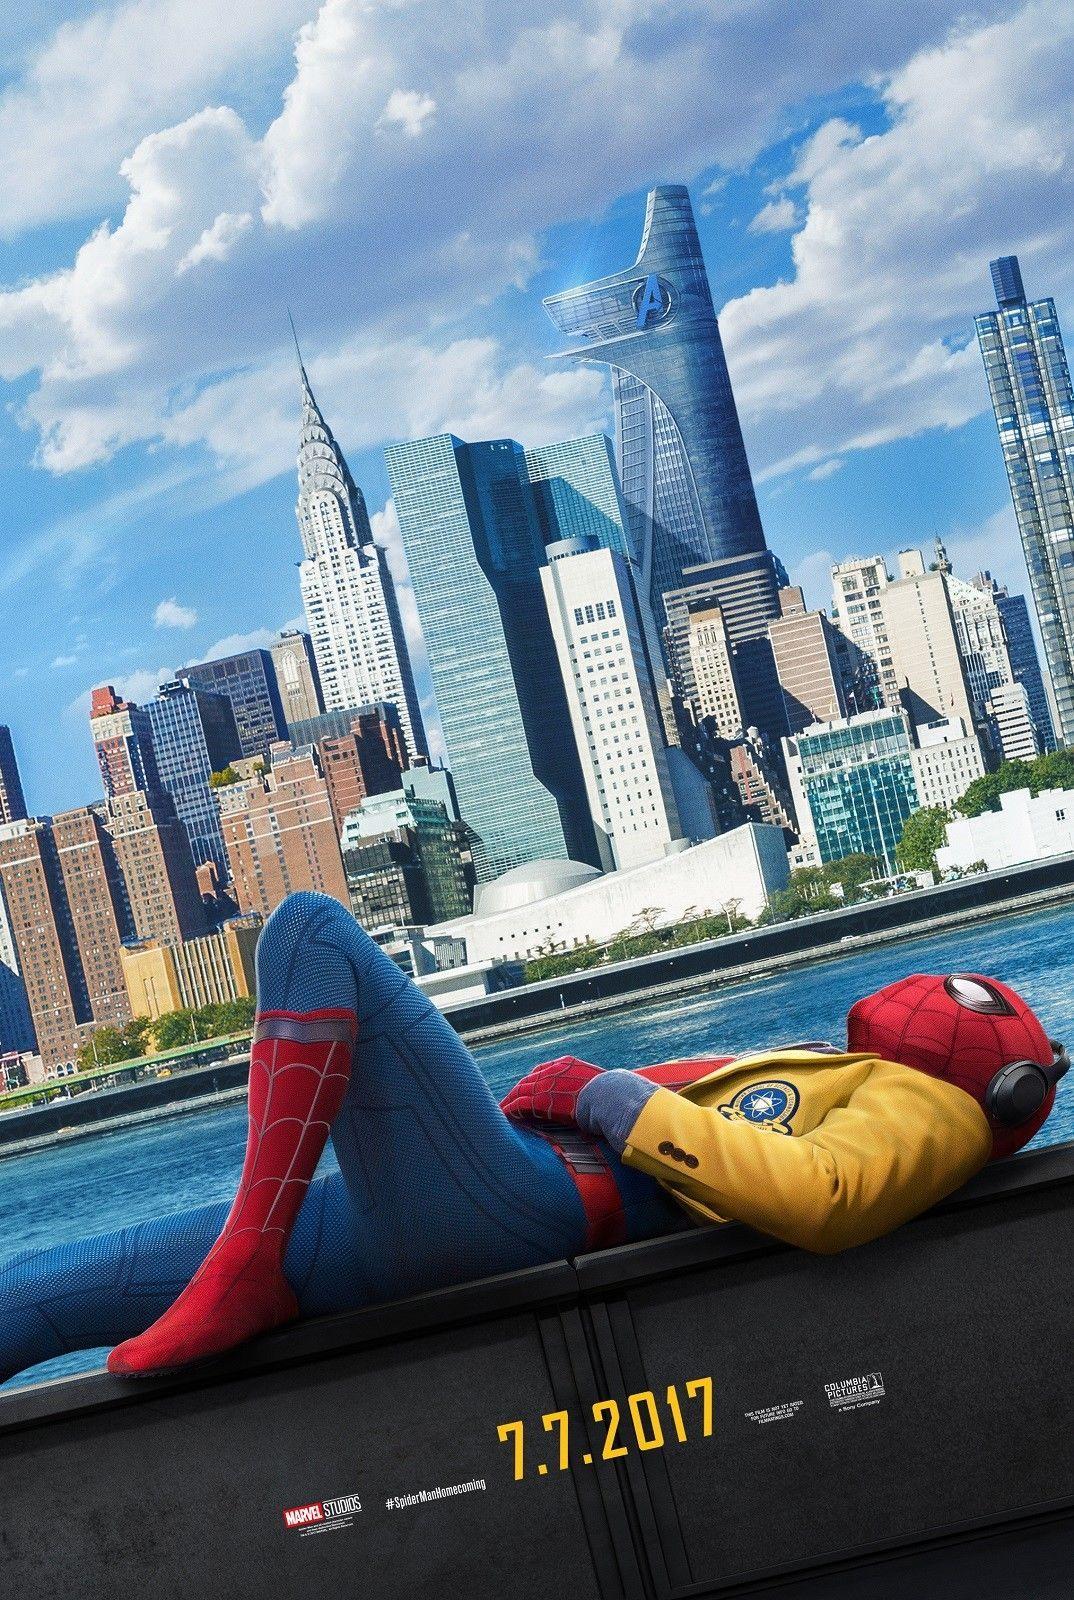 affiche-murale-en-soie-art-spiderman-homecoming.jpg